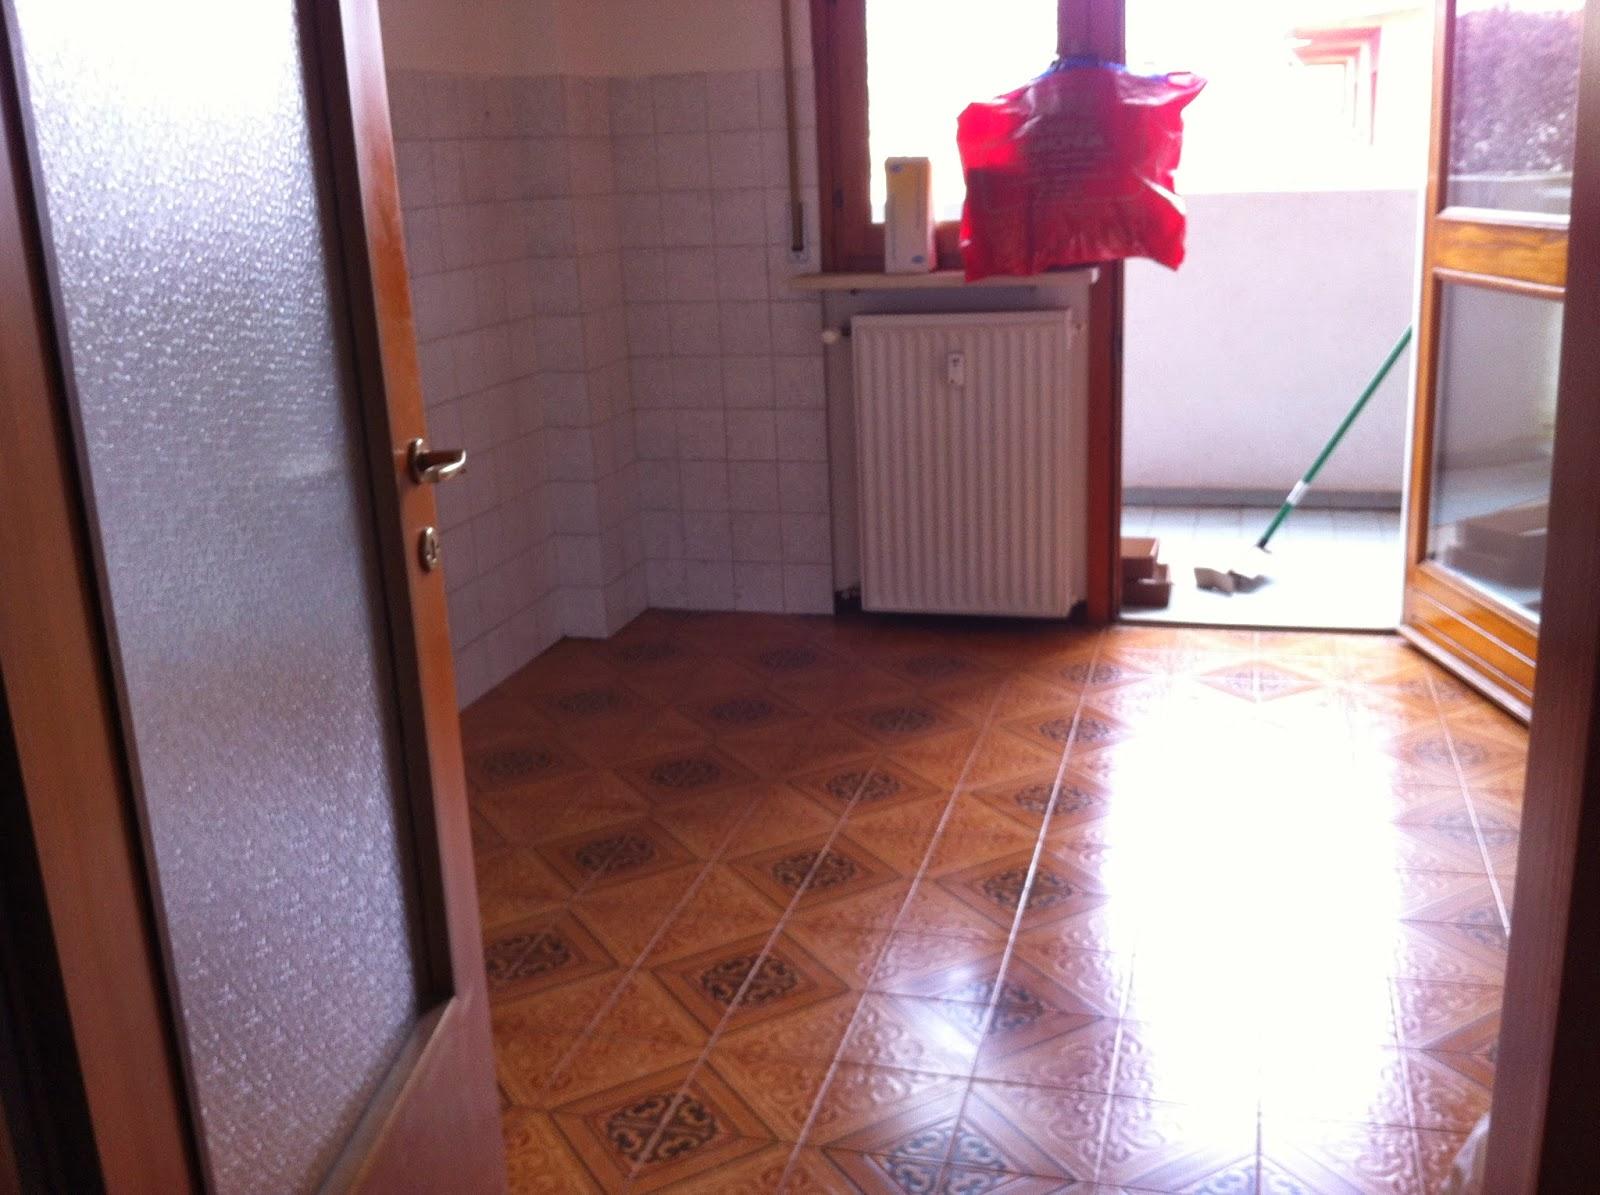 Piastrelle in vinile cucina pavimenti in vinile simil legno best